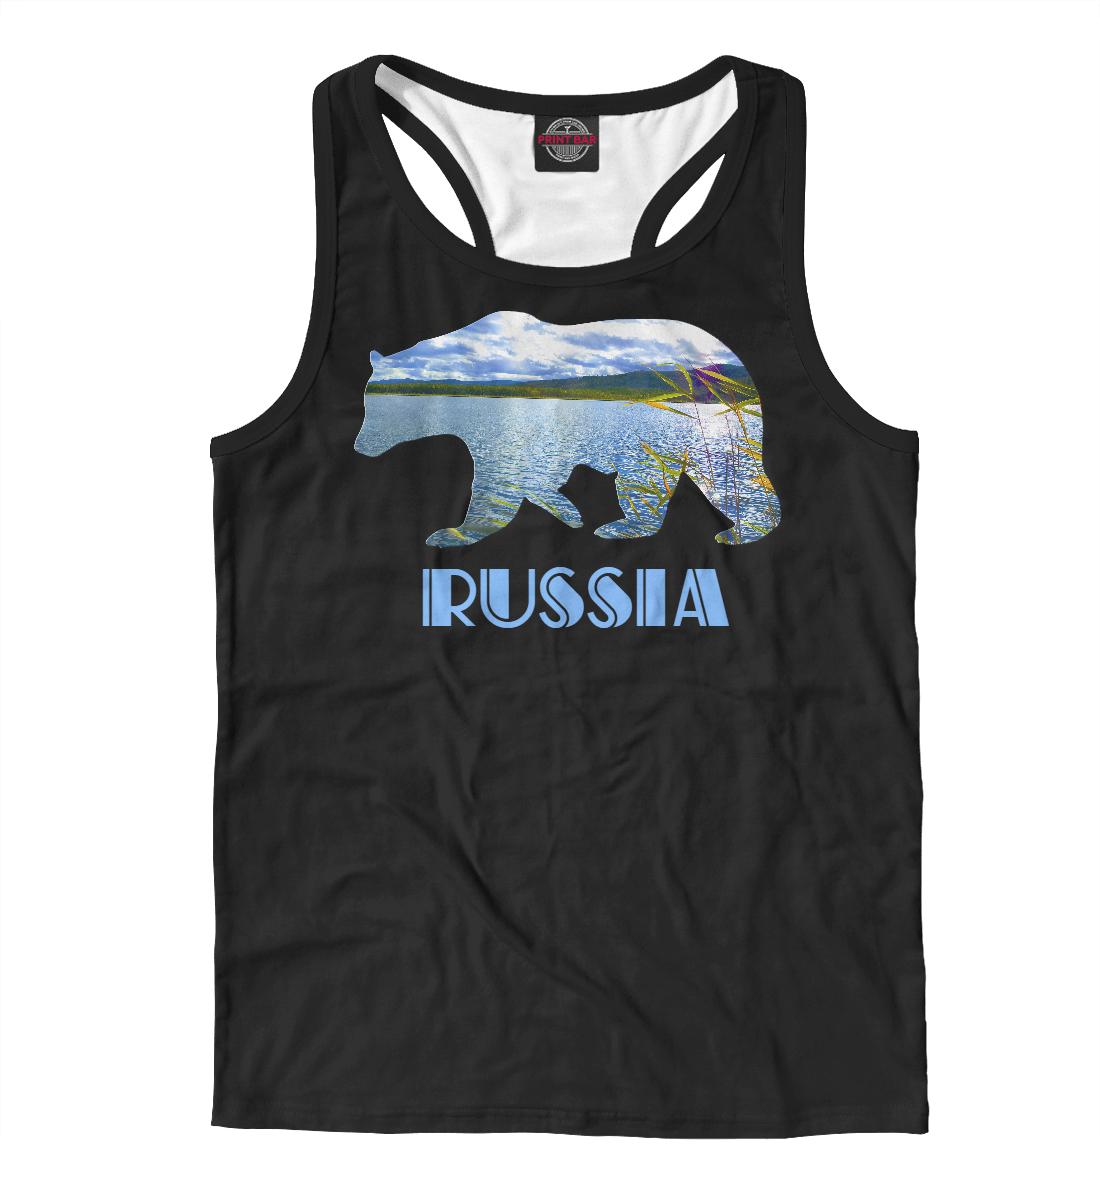 Купить Моя Россия - Мои просторы, Printbar, Майки борцовки, VSY-974569-mayb-2